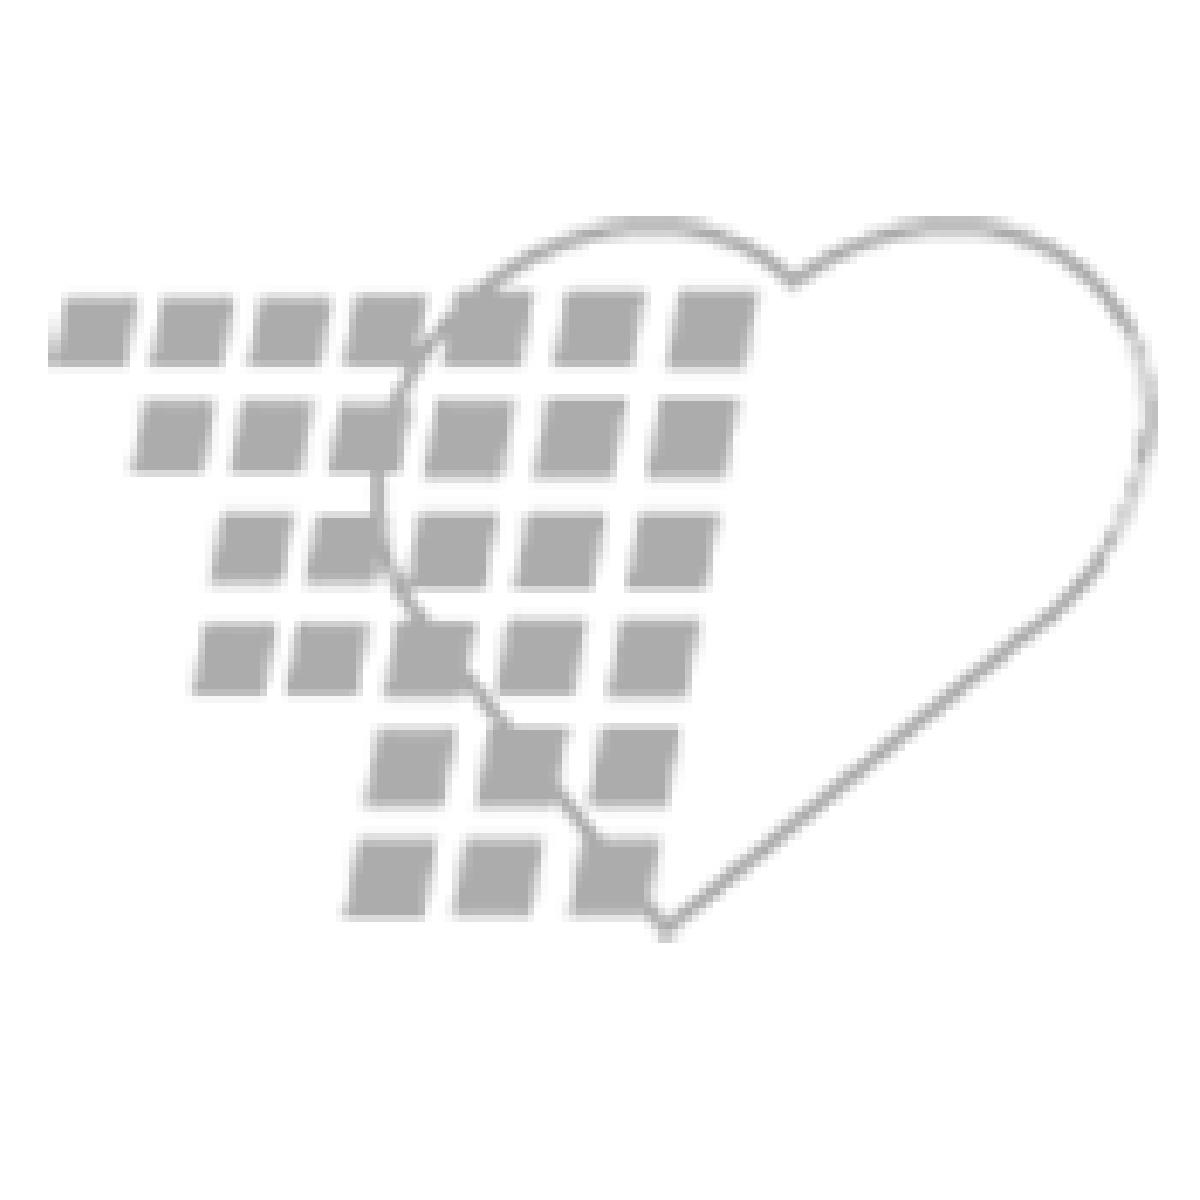 06-26-1632 - Terumo Surshield® Safety IV Catheter 18g x 1.25in